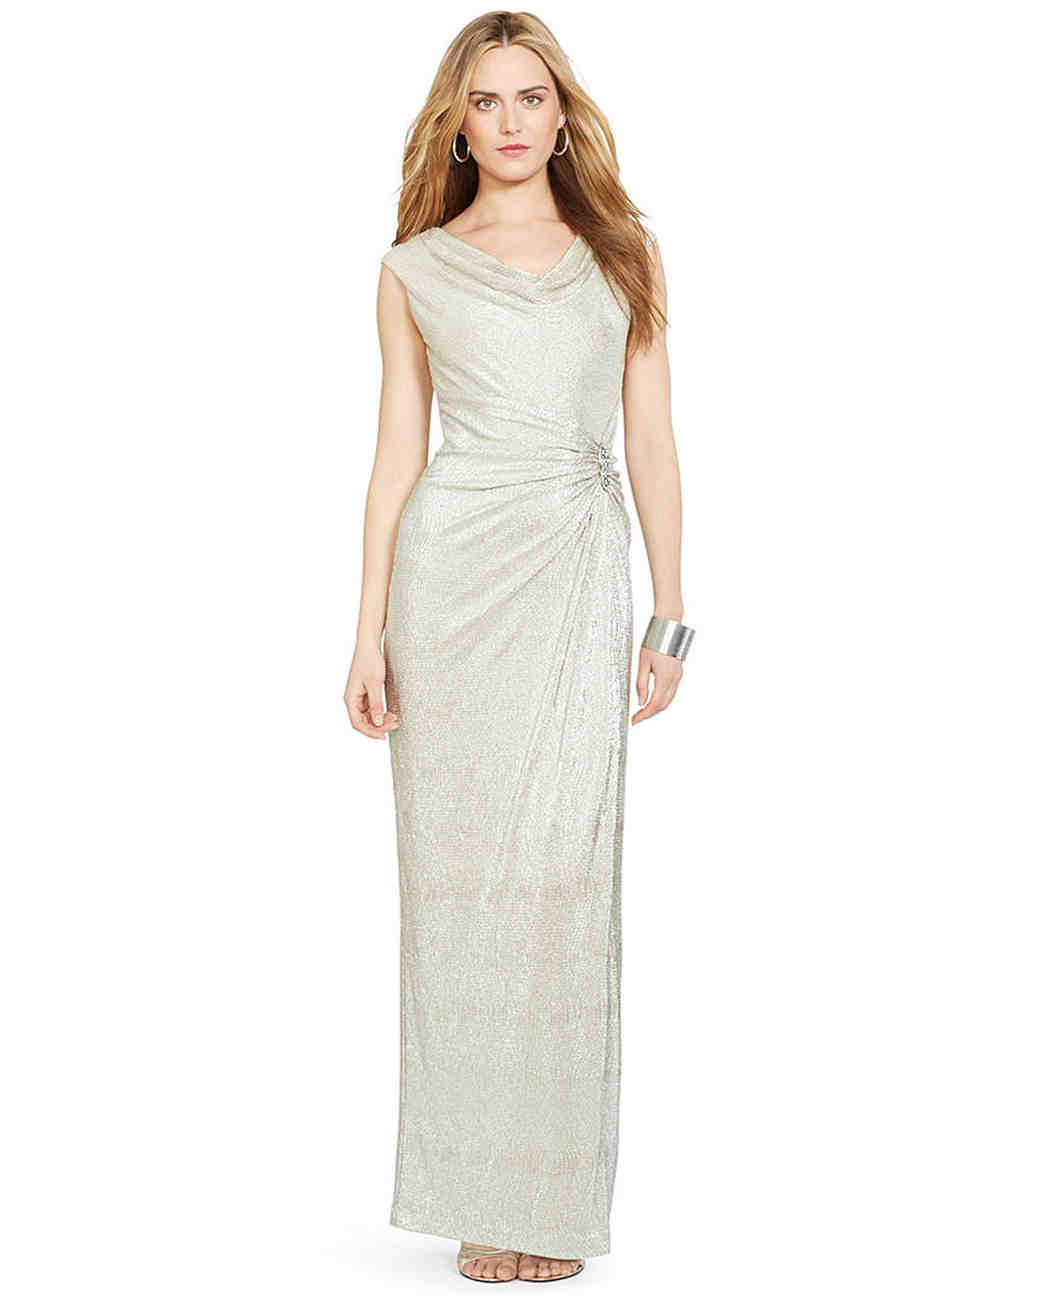 winter bridesmaid dress ralph lauren silver embellished metallic